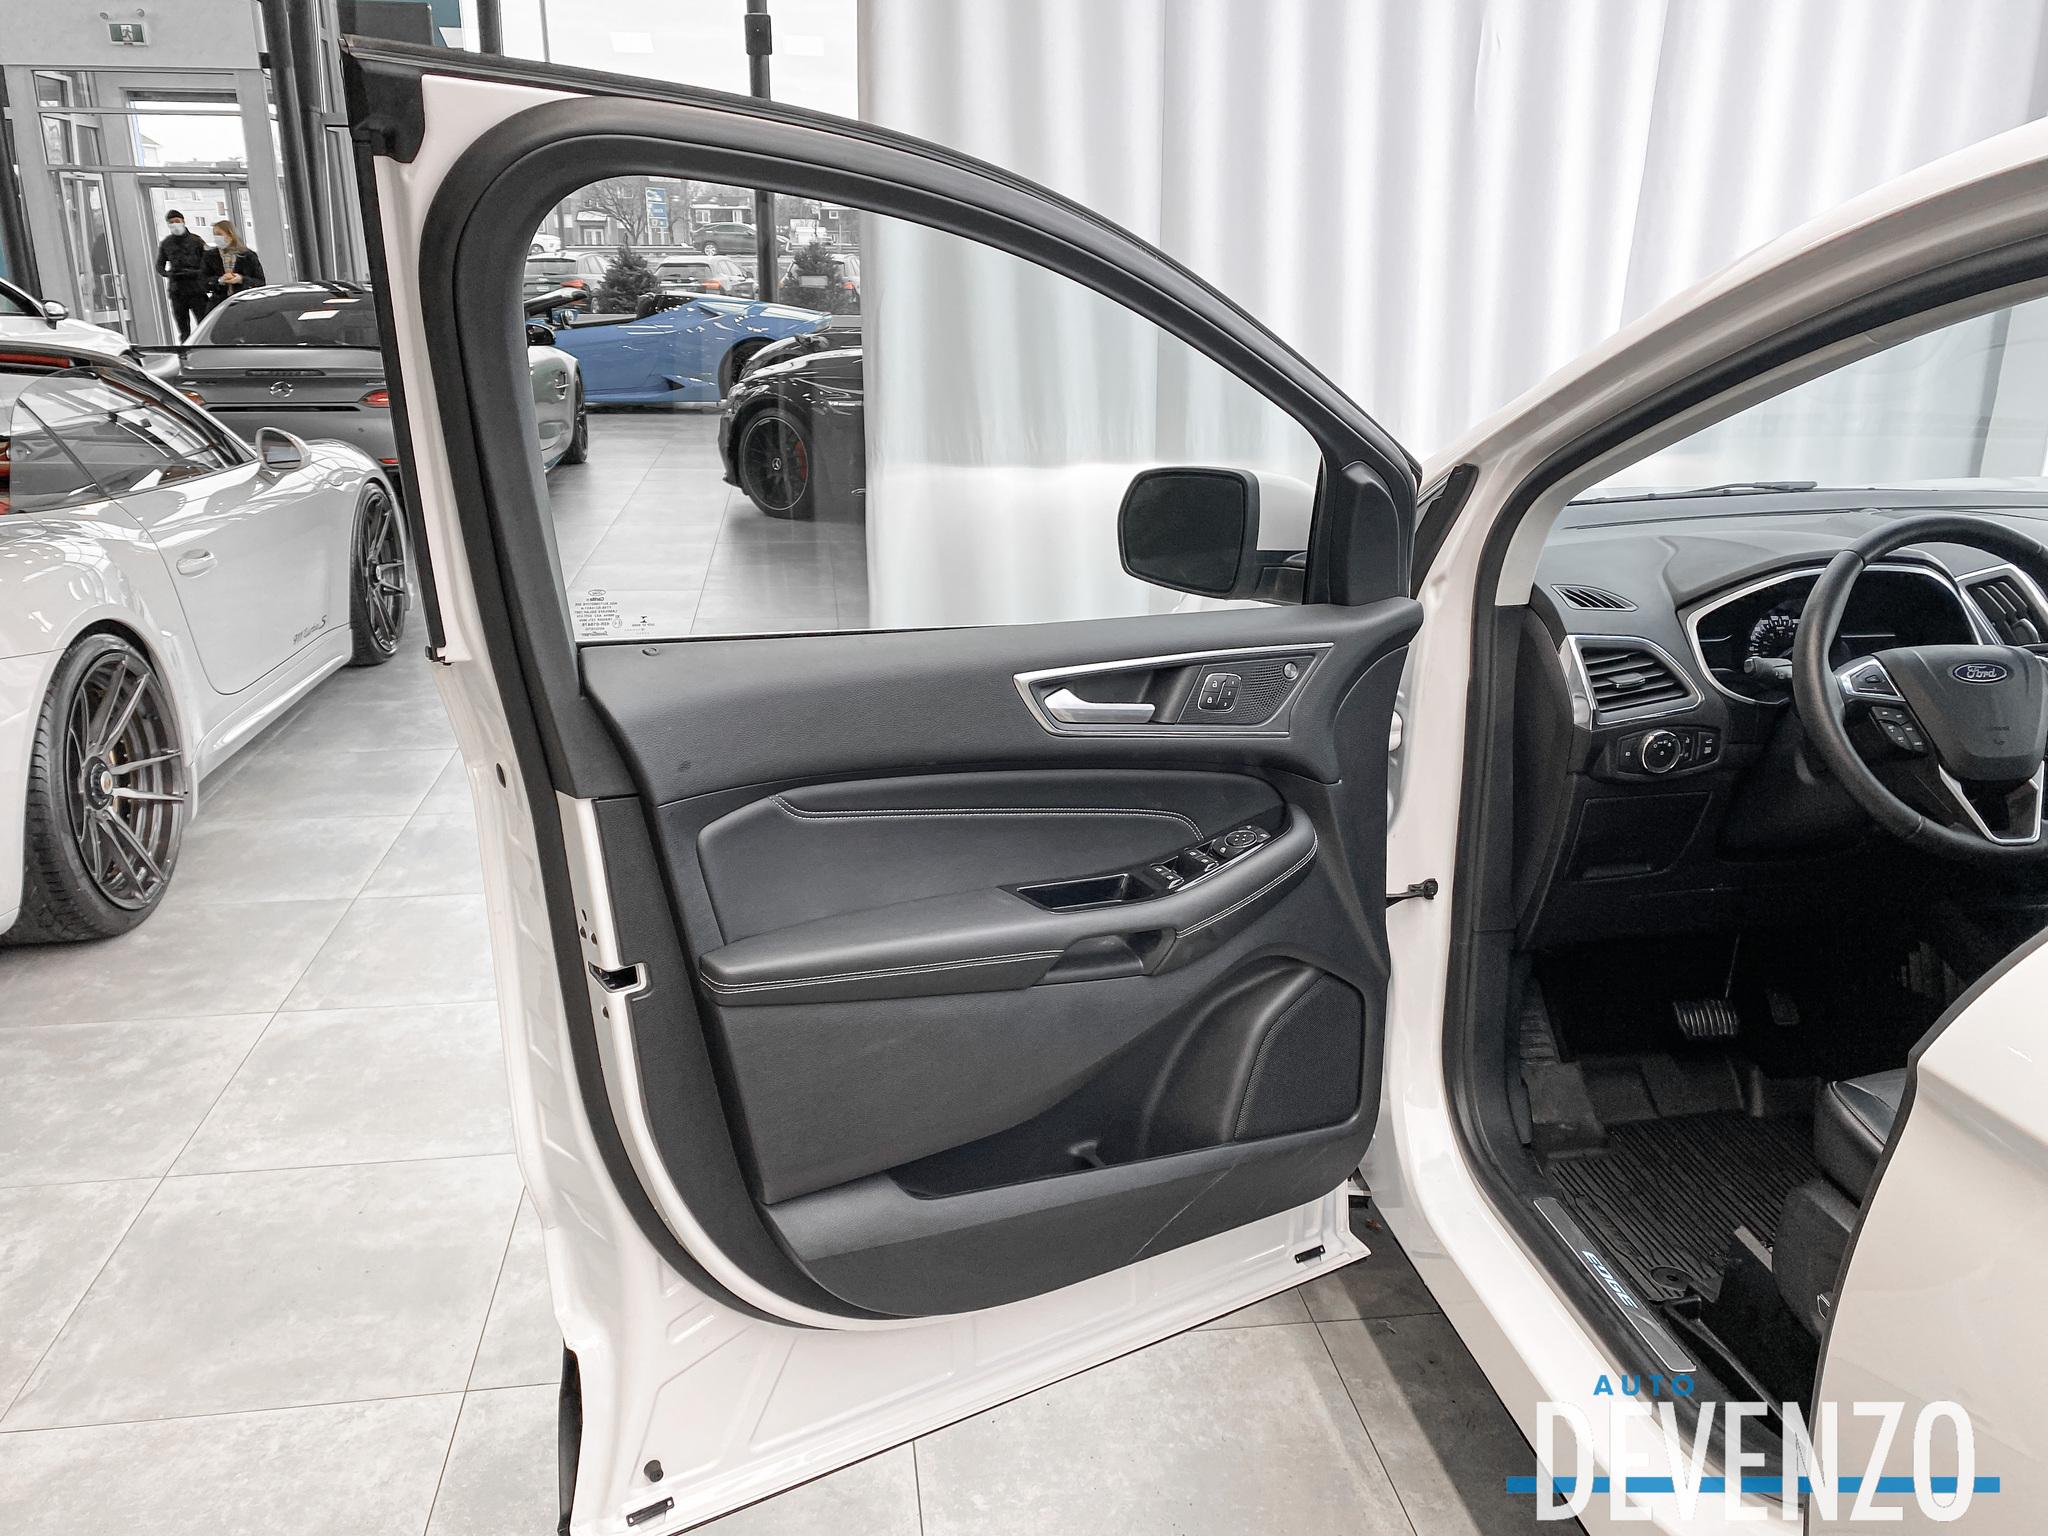 2019 Ford Edge Titanium AWD ECOBOOST TOIT PANO / NAVI / CAMERA complet